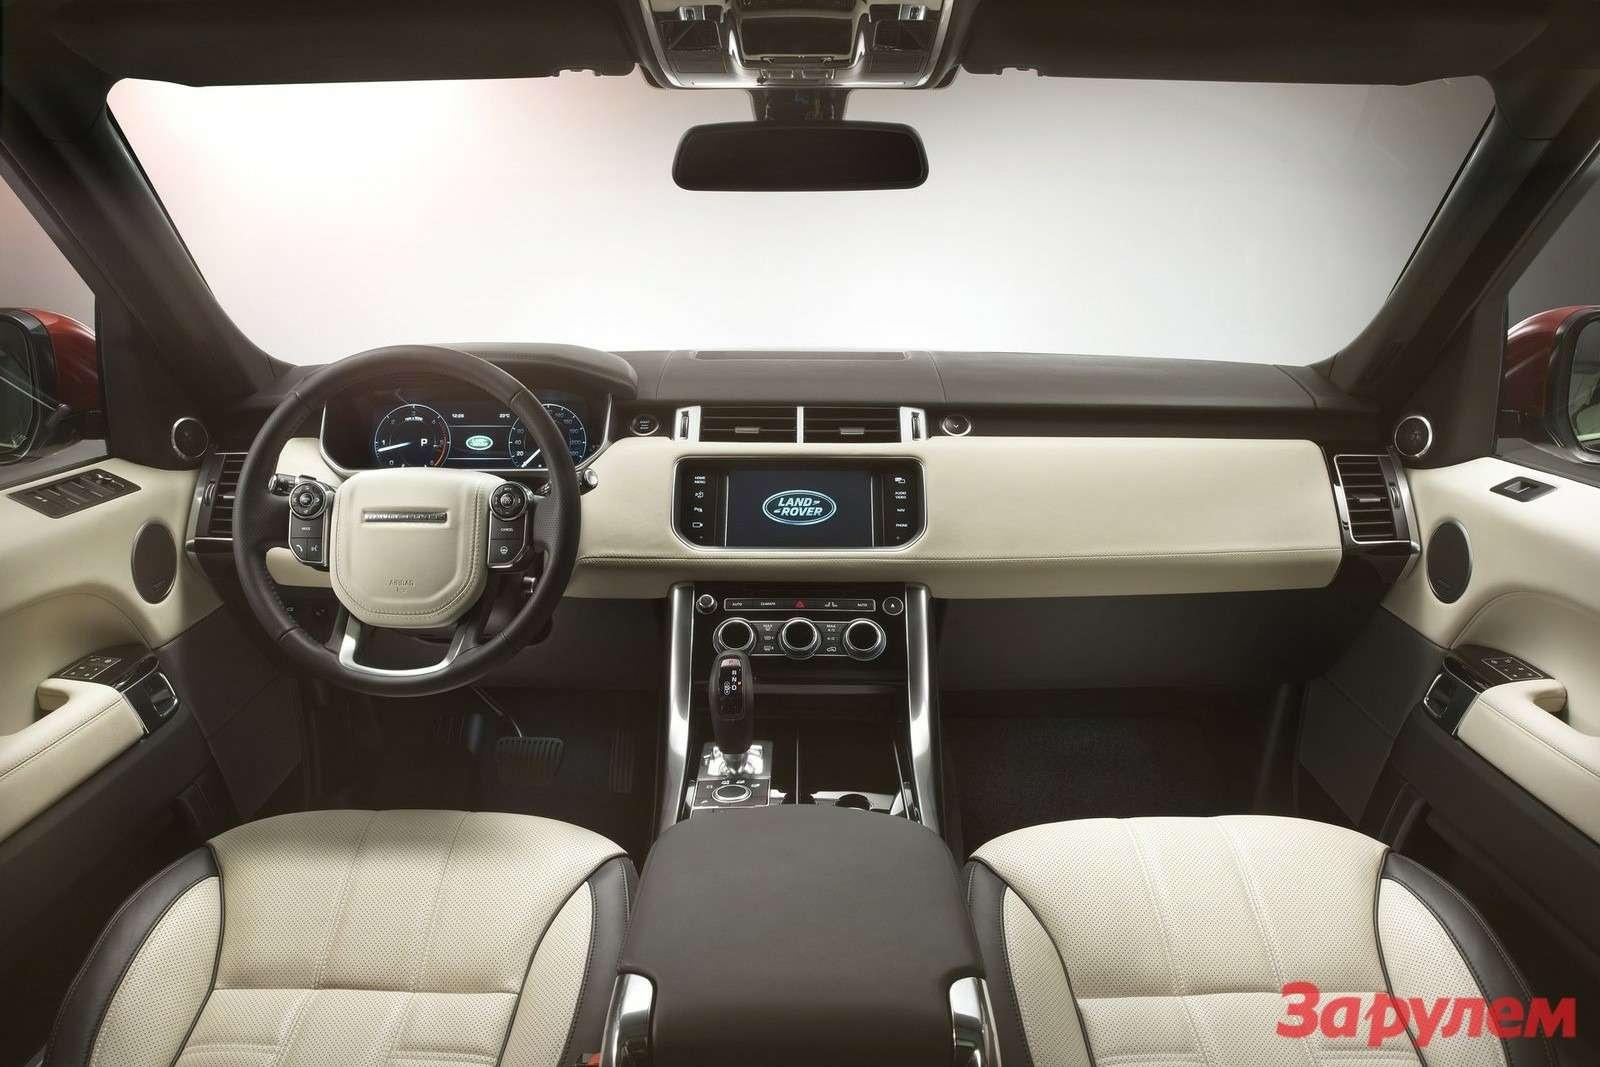 Land Rover Range Rover Sport 2014 1600x1200 wallpaper 36